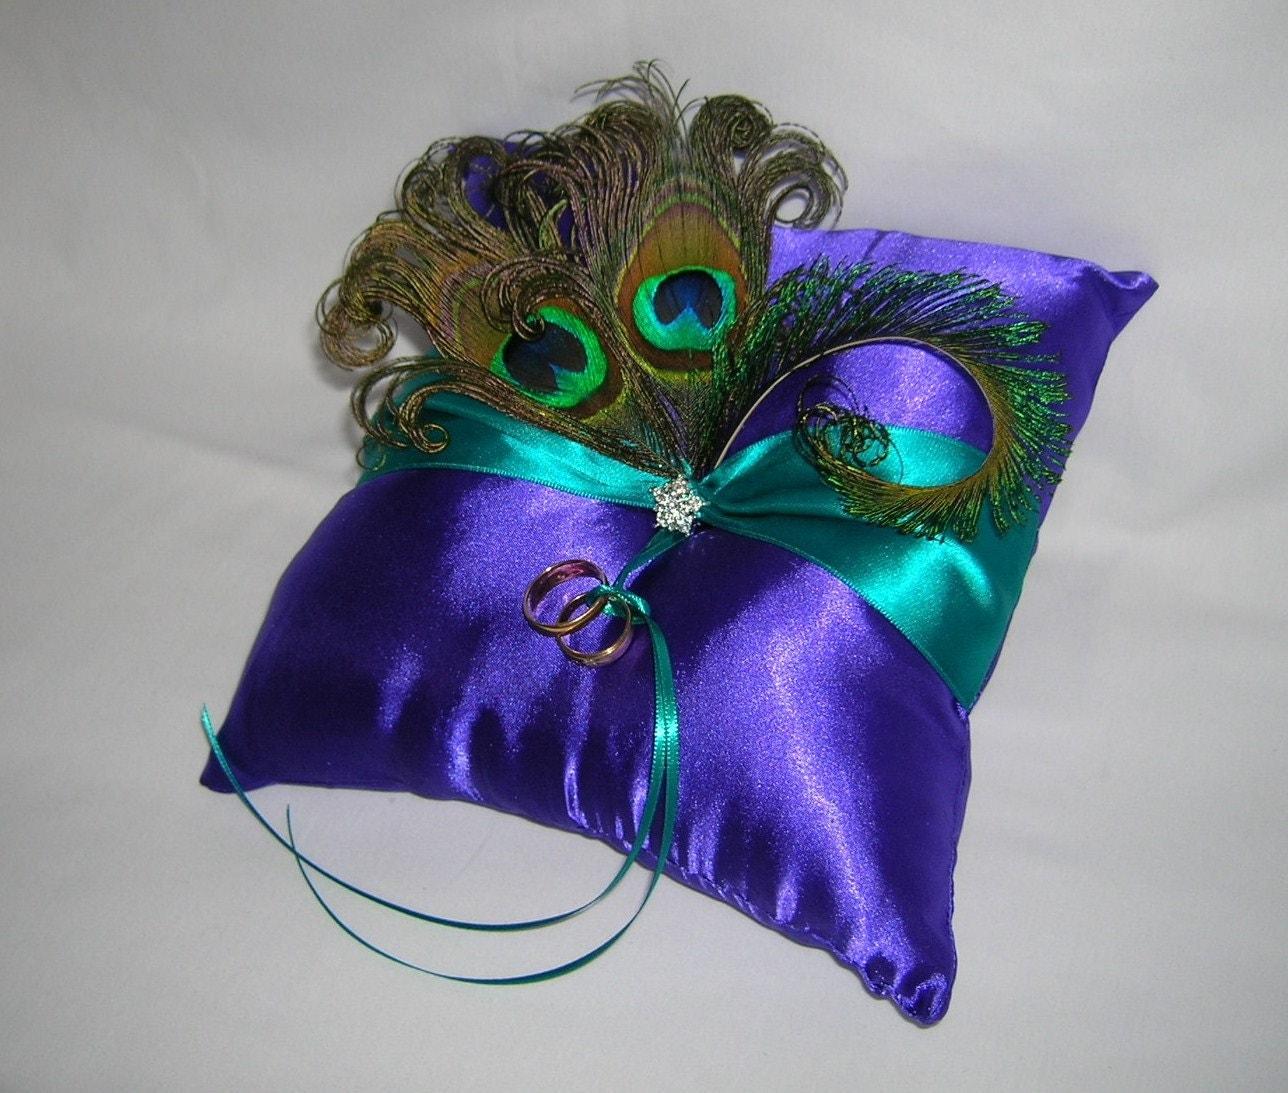 peacock wedding ring bearer pillow royal purple satin with